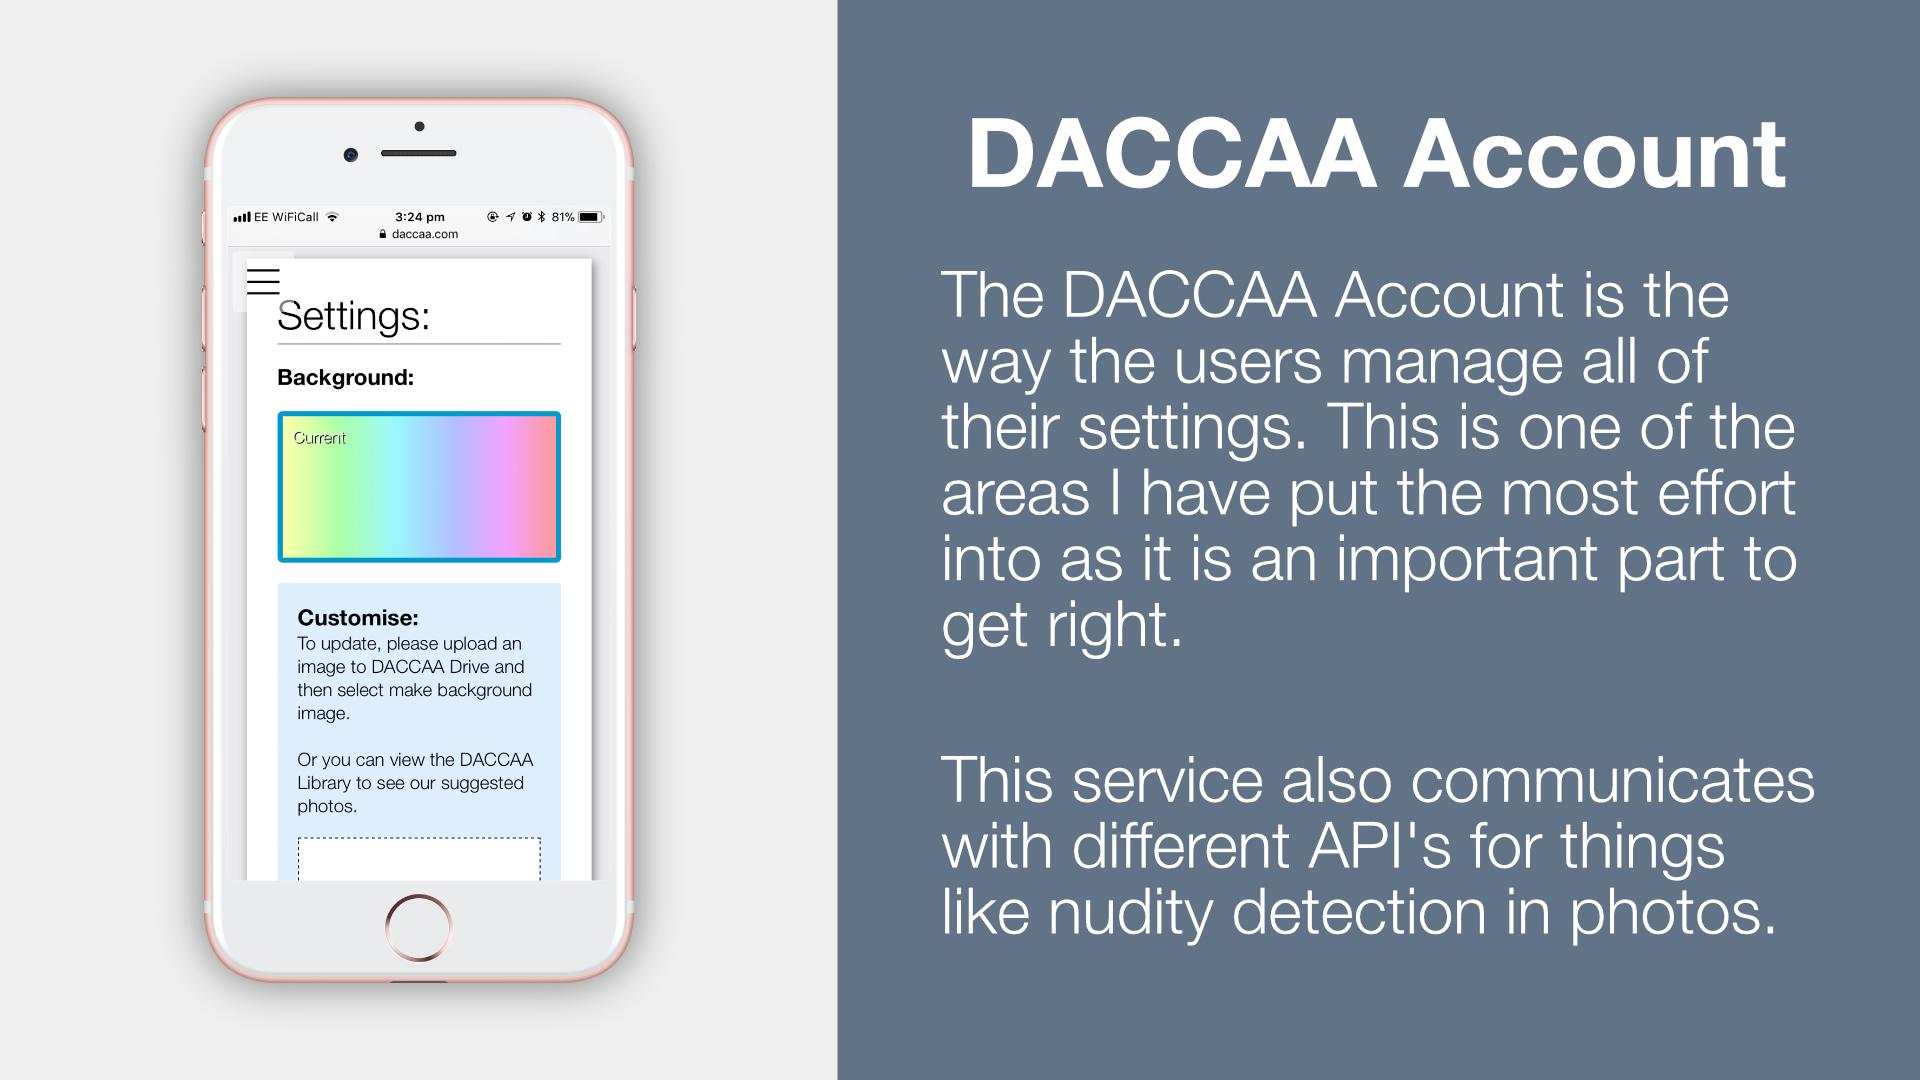 DACCAA Account